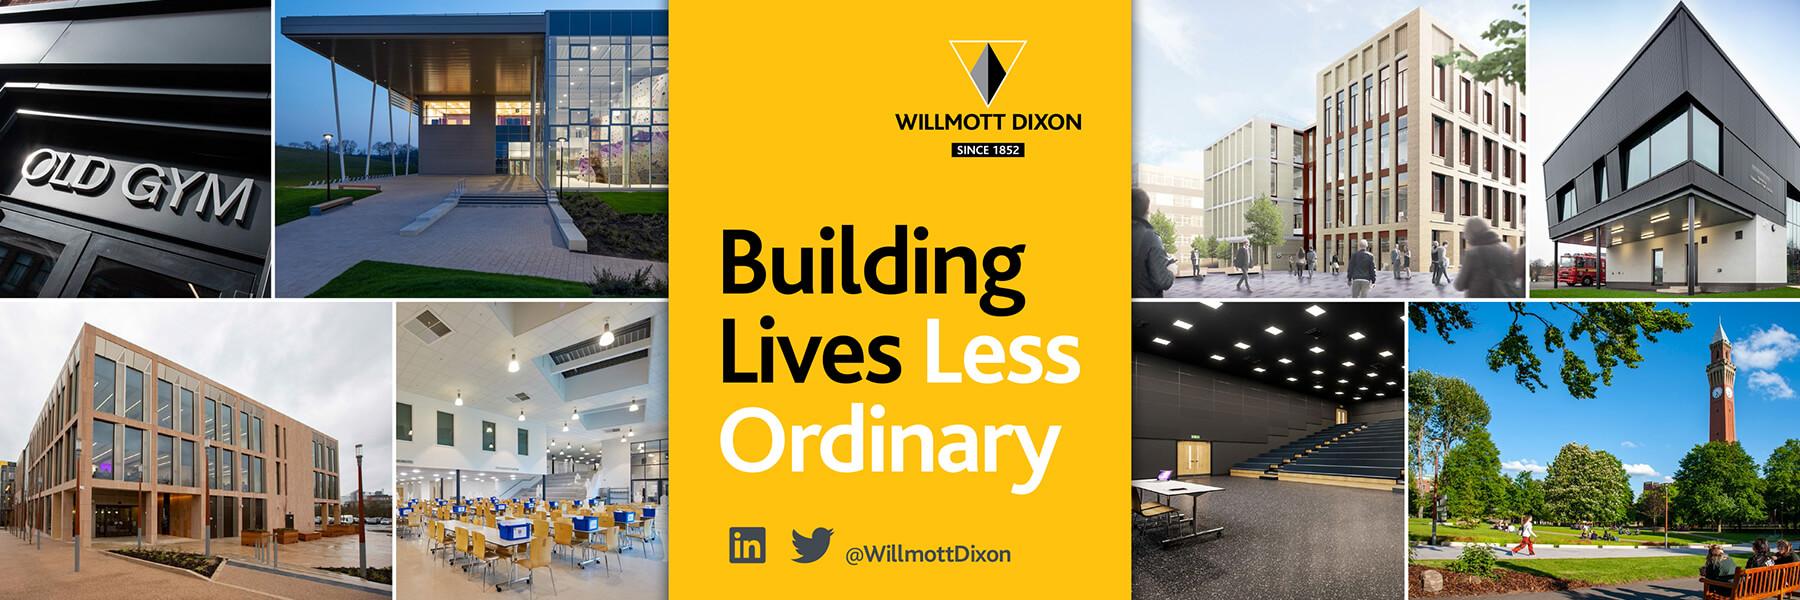 Willmott dixon collage of work with slogan